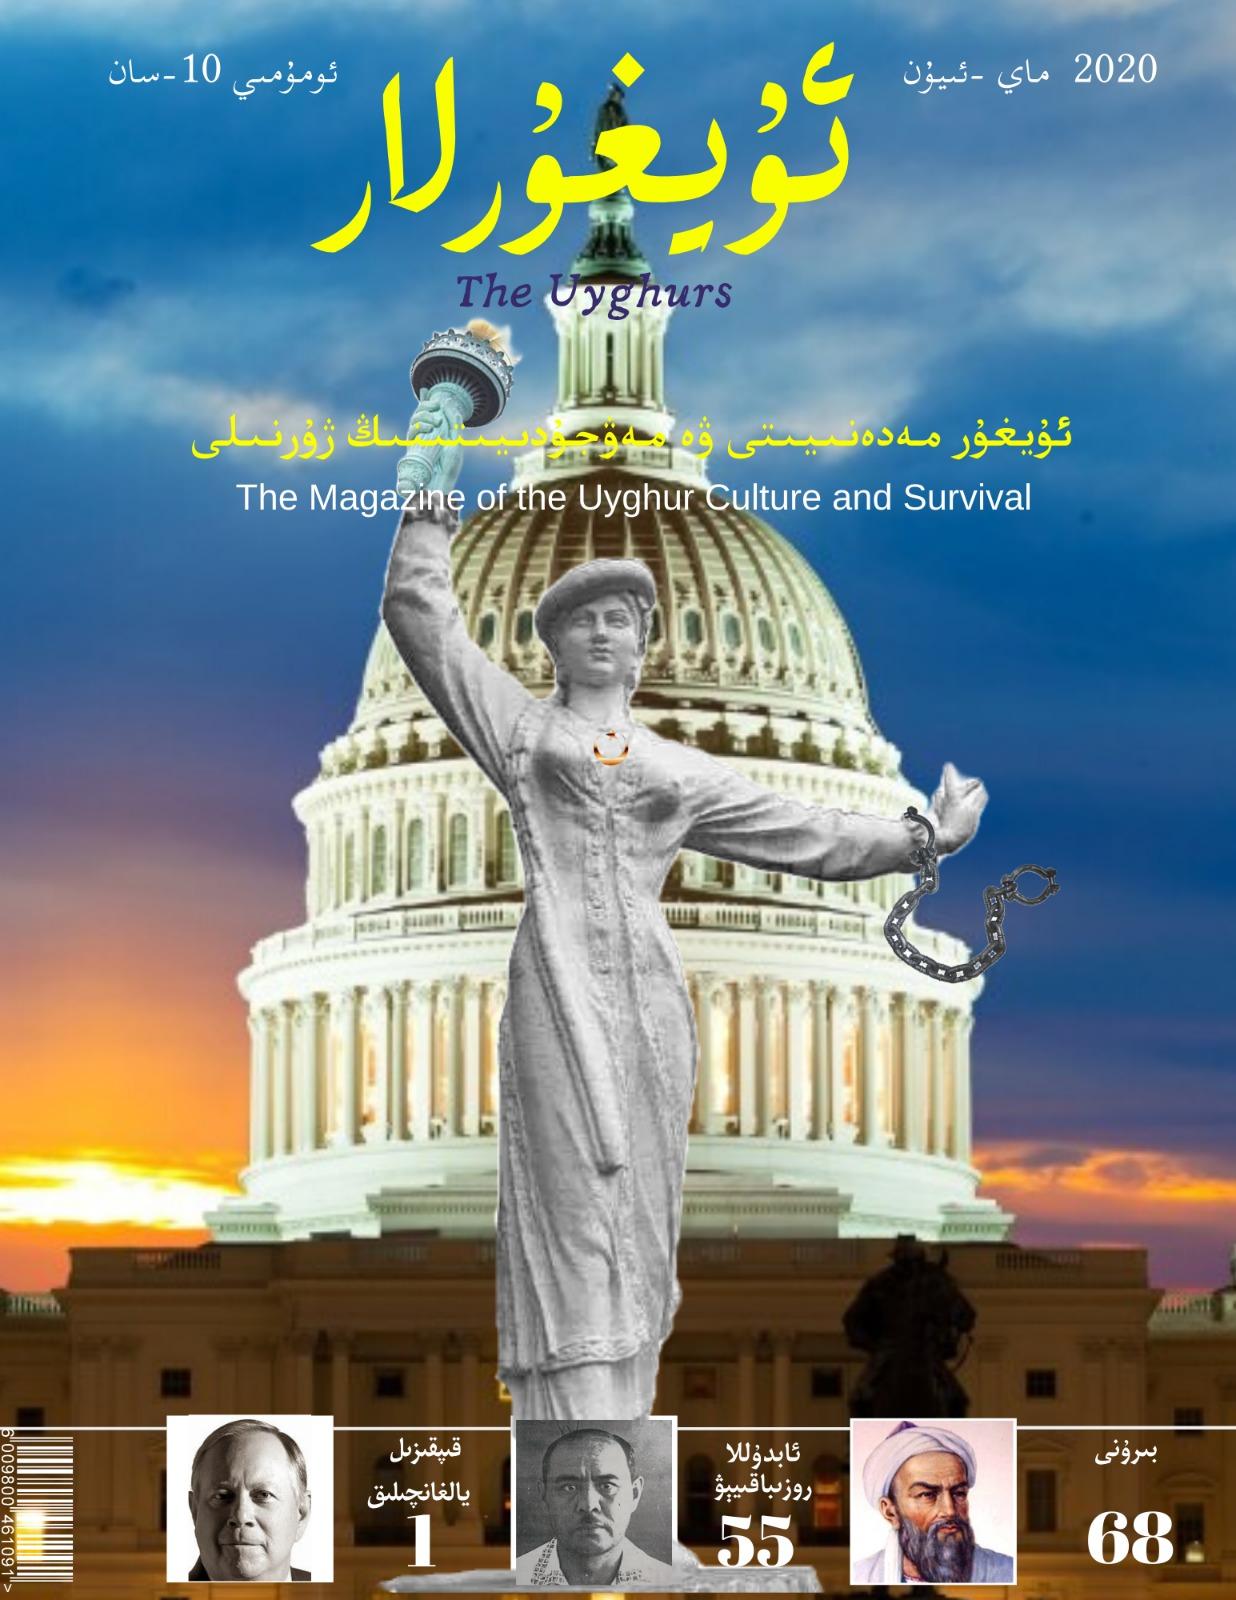 uyghur10 - ئۇيغۇرلار 2020-يىلى 10-سان